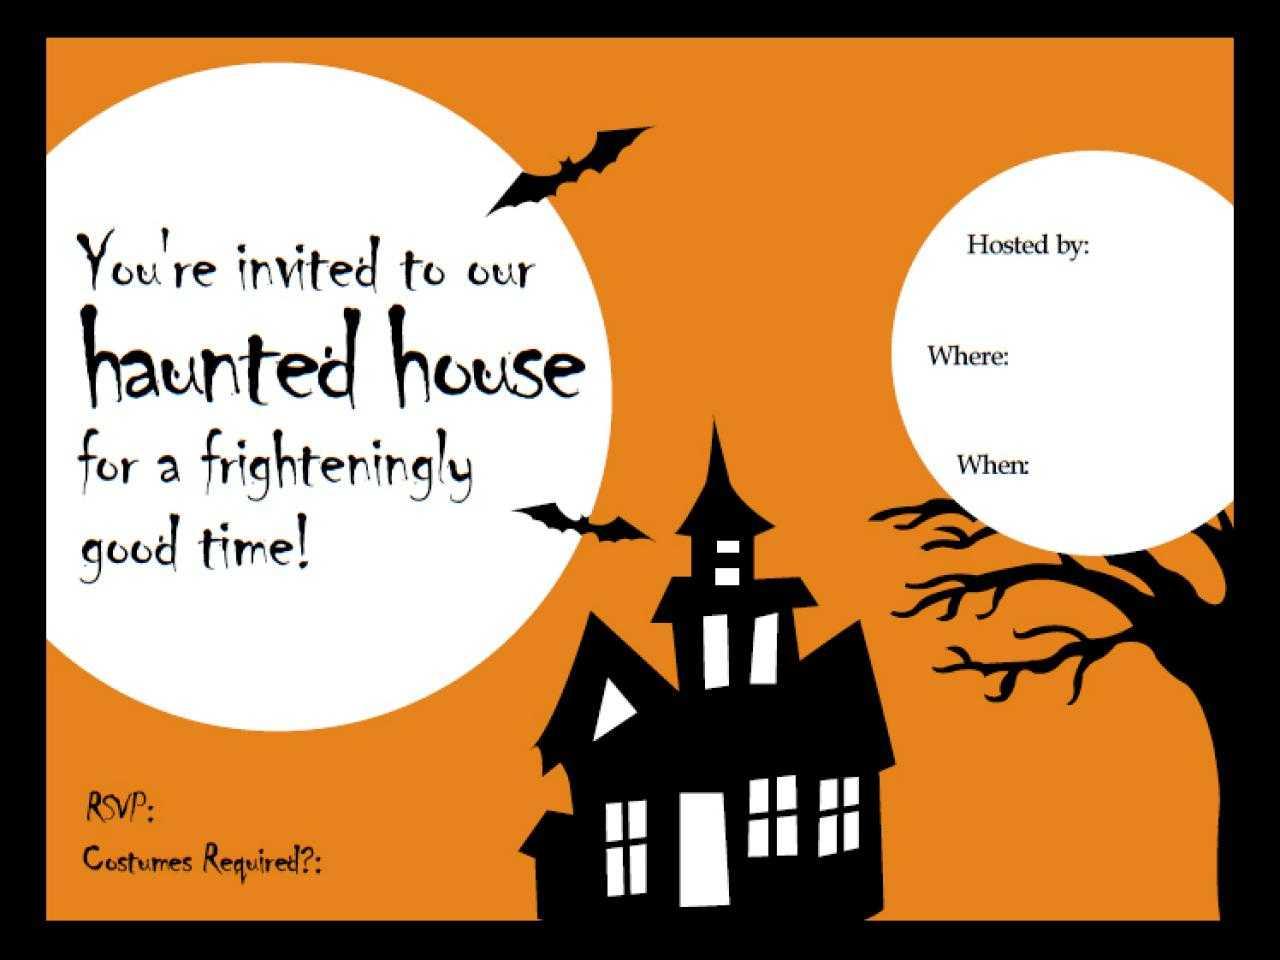 014 Free Halloween Newsletter Templates Word Template Inside Free Halloween Templates For Word